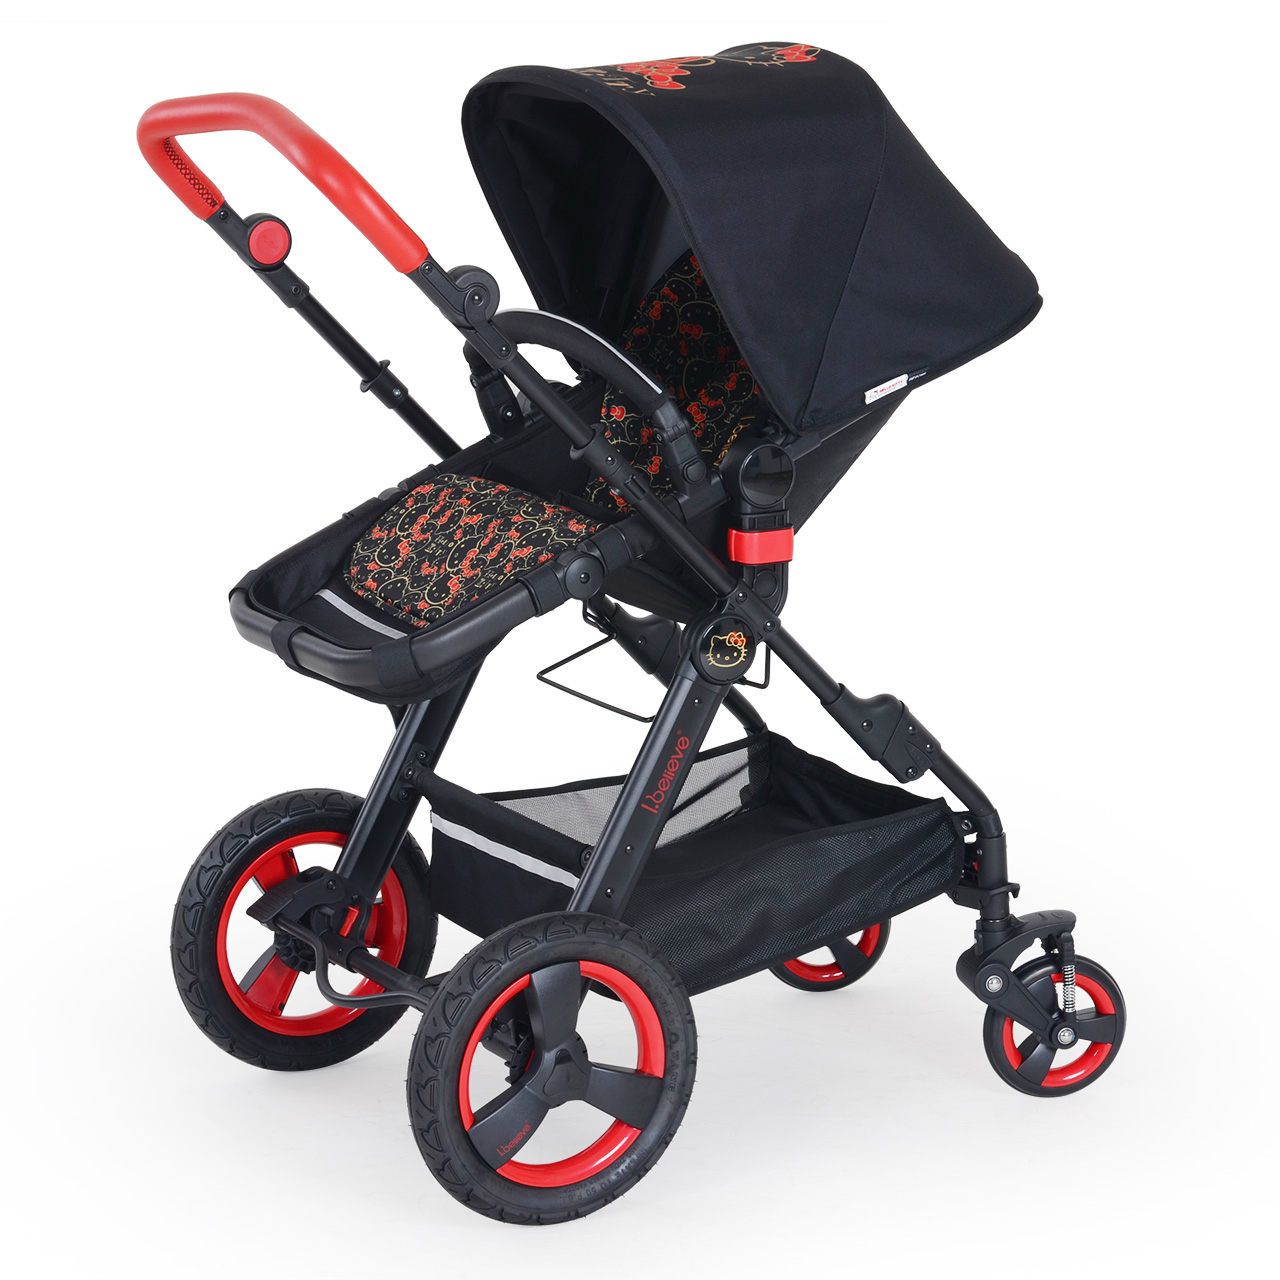 New Design Cute Cartoon High Landscape Siting Baby Stroller Lying Folding Easy Baby Cart Shockproof Lightweight Portable Pram как продать лобстера книга бесплатно